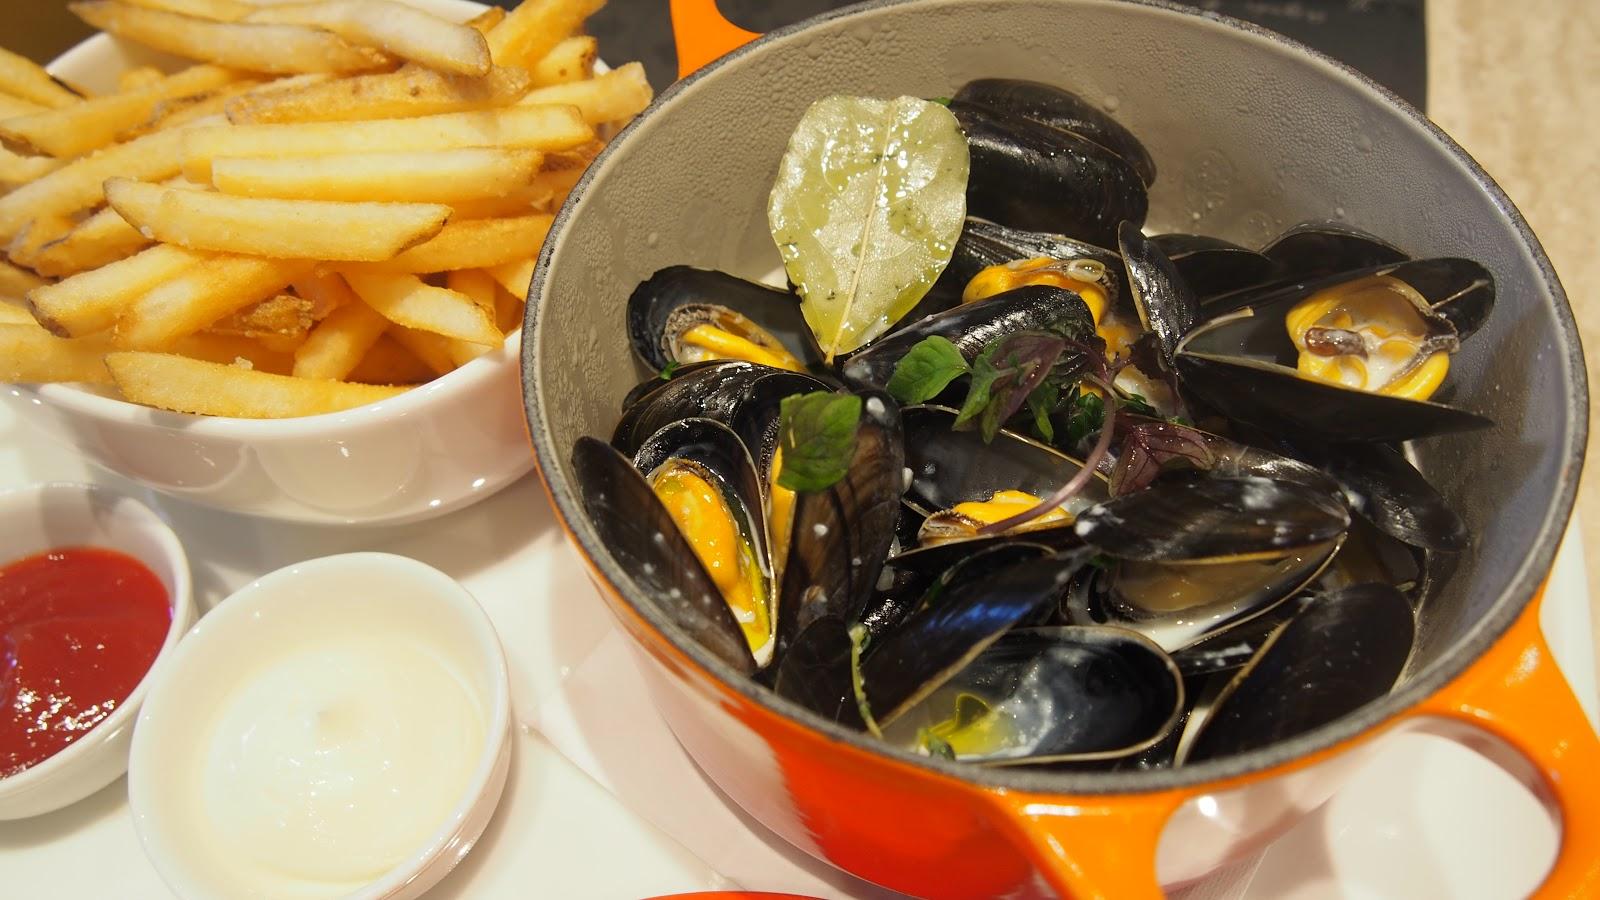 agnes b le pain grille mussels fries